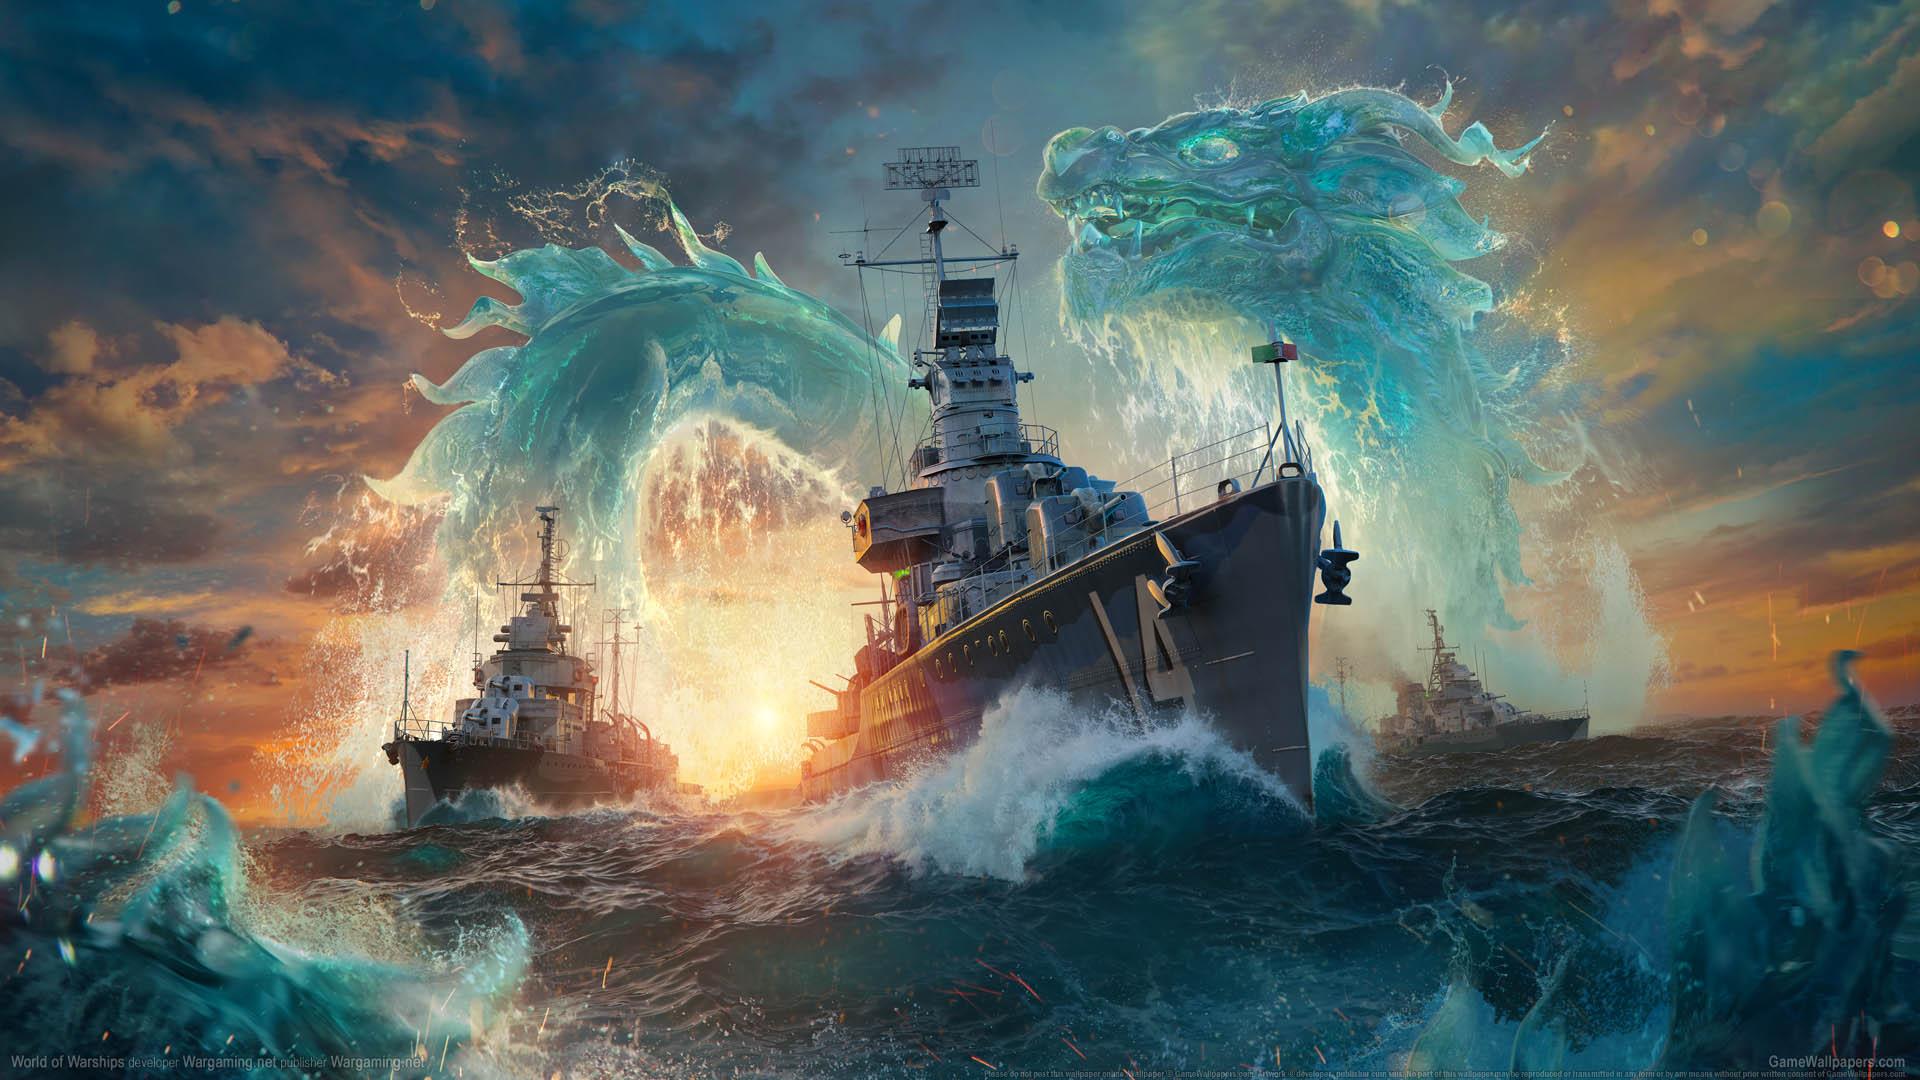 World of Warships fond d'écran 17 1920x1080